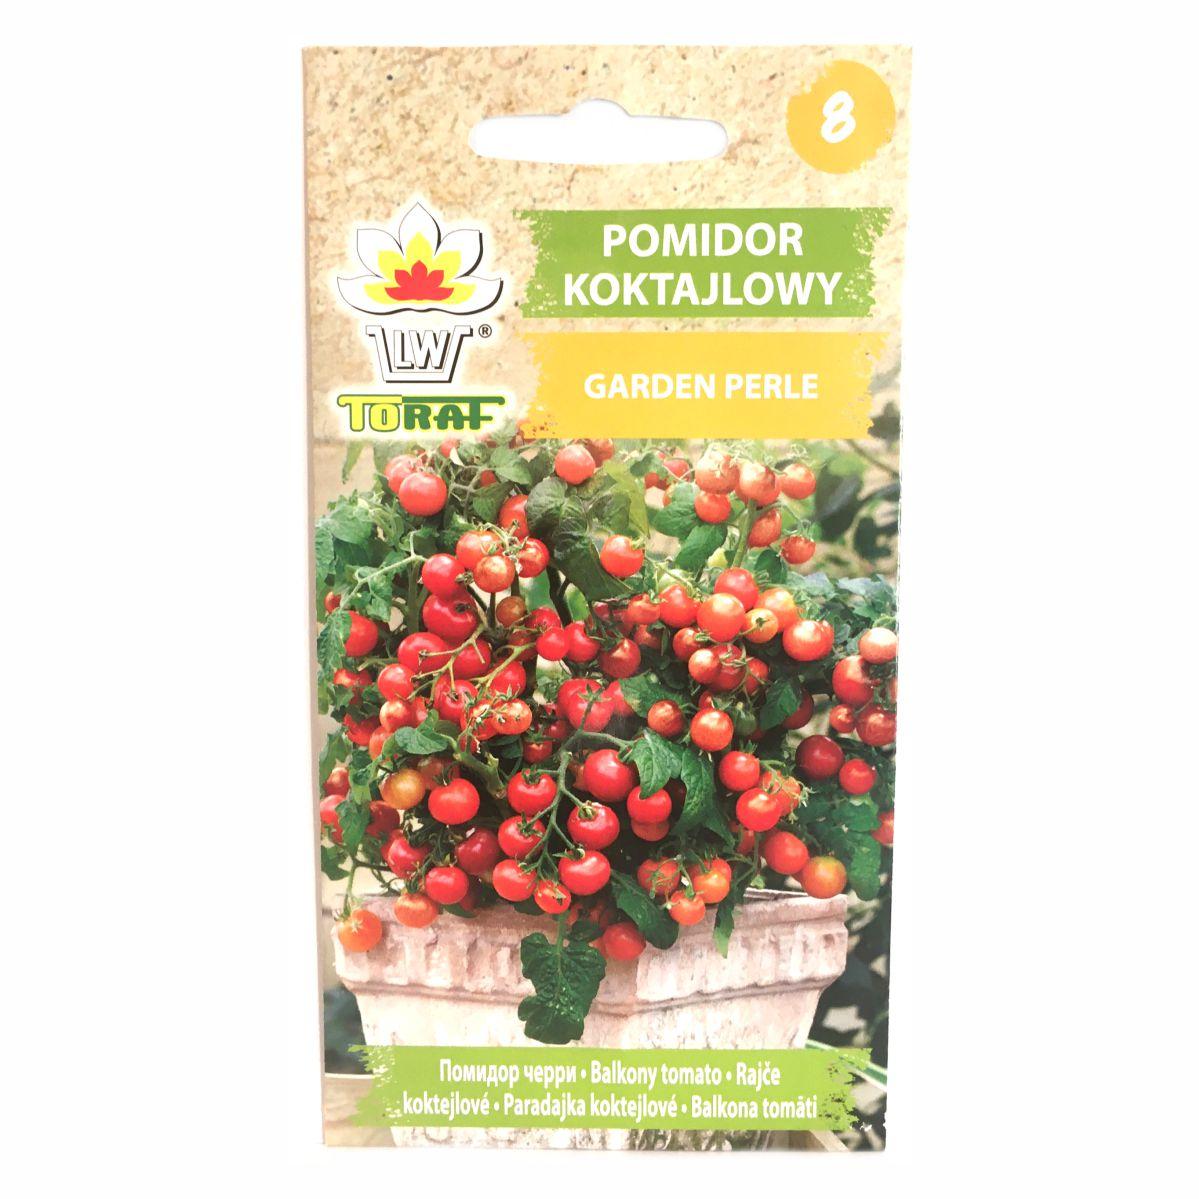 Pomidor Garden Perle nasiona Toraf